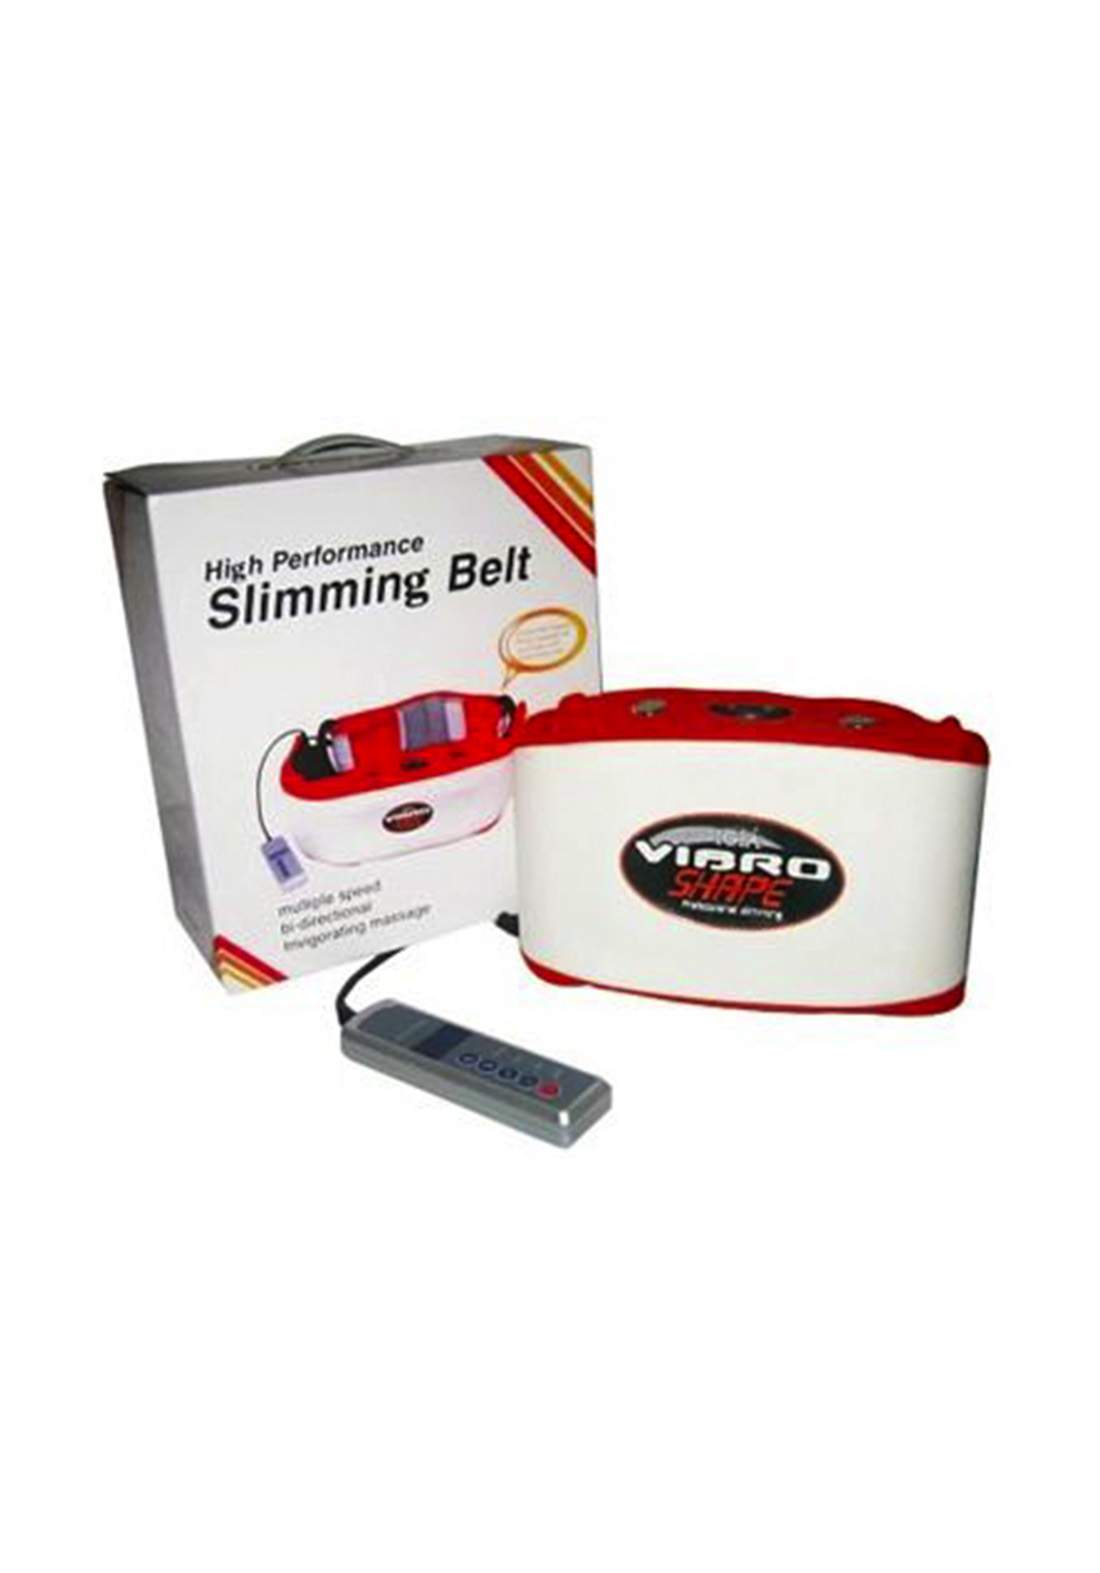 Vibro Shape High Performance Slimming Belt حزام هزاز لتخسيس عالي الاداء